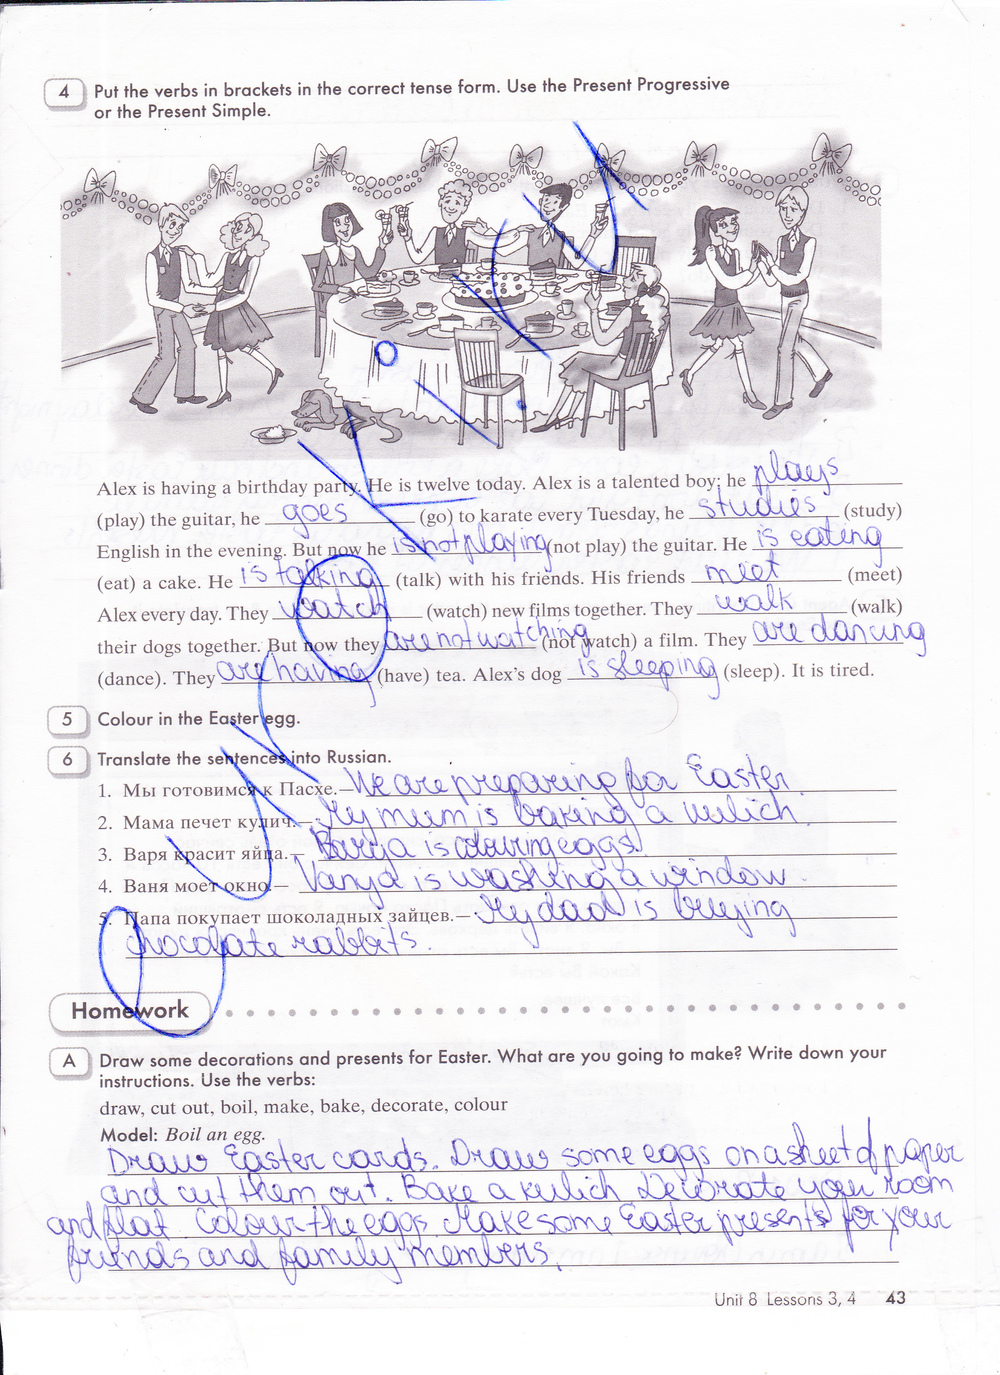 гдз по английскому 5 класс кауфман и кауфман рабочая тетрадь